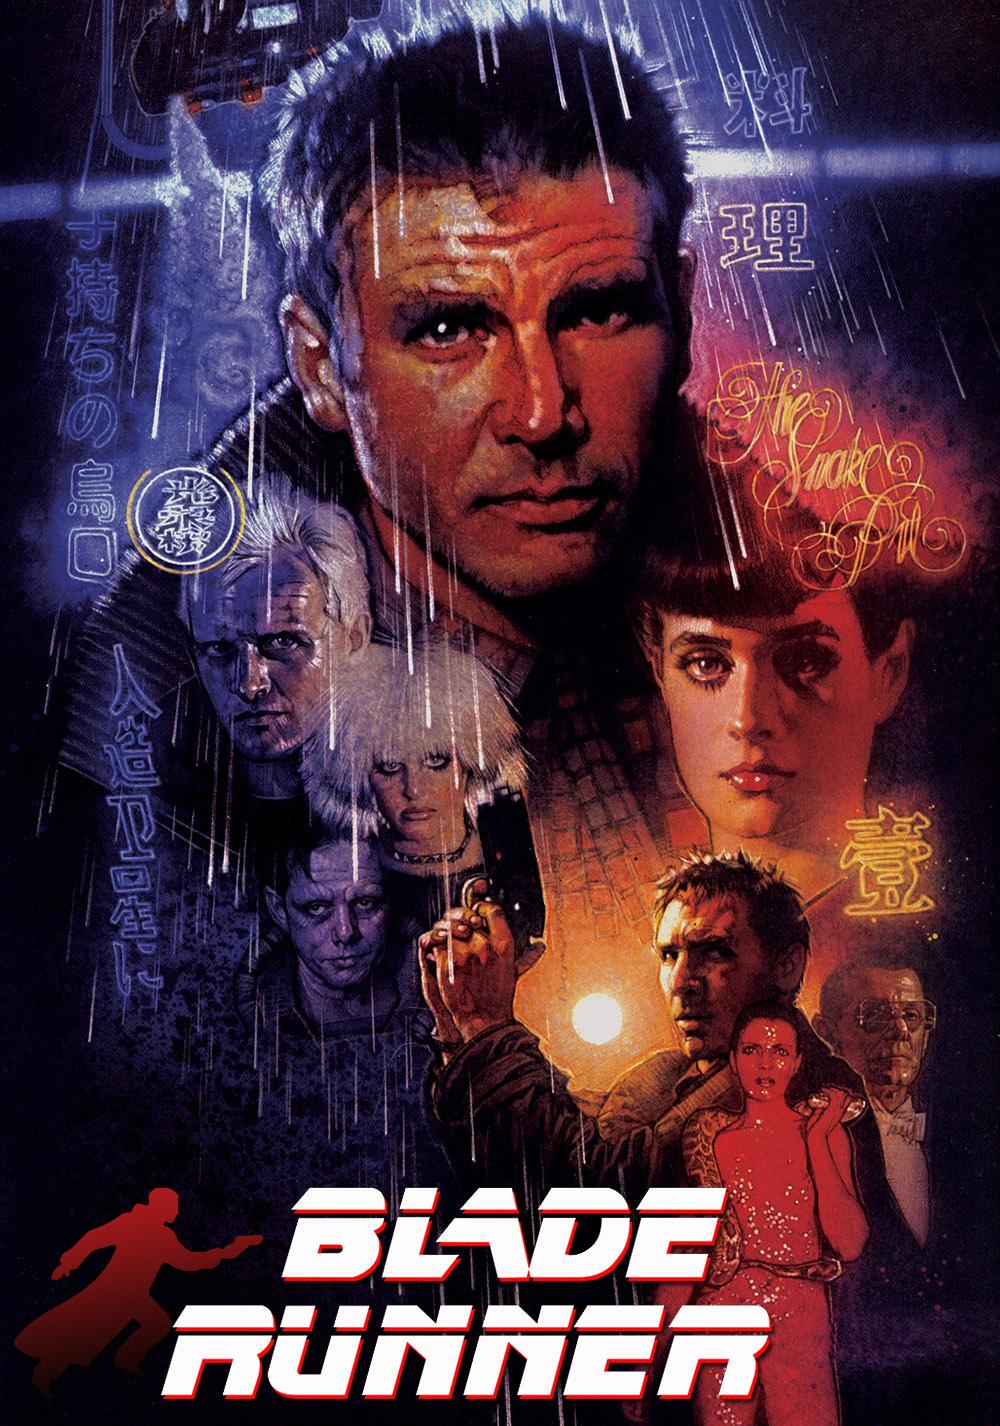 Blade Runner YIFY subtitles